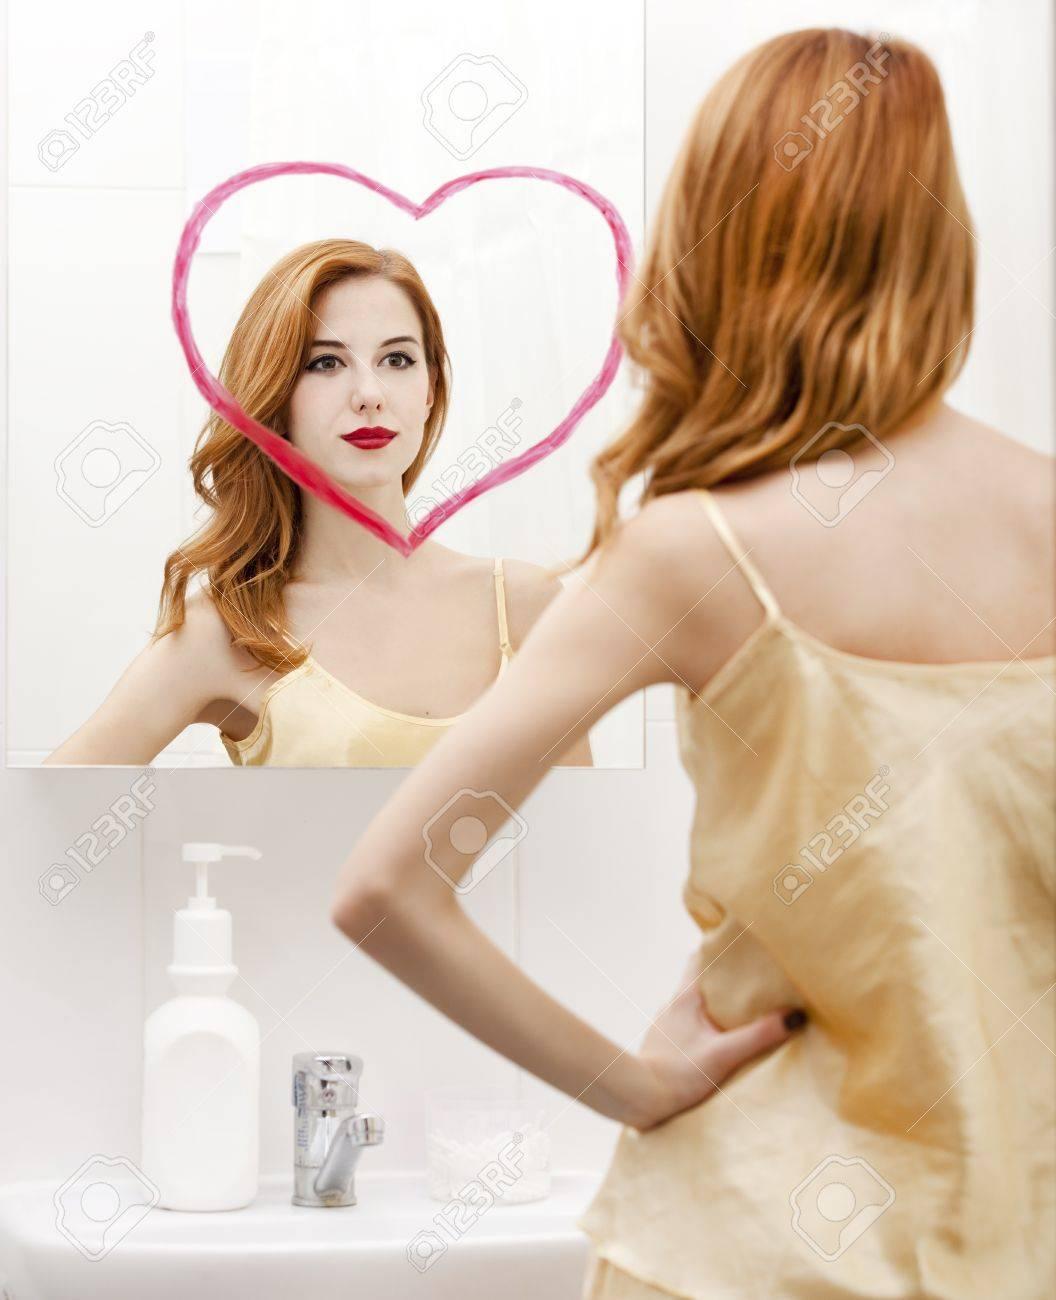 Redhead girl near mirror with heart it in bathroom. Stock Photo - 16824857